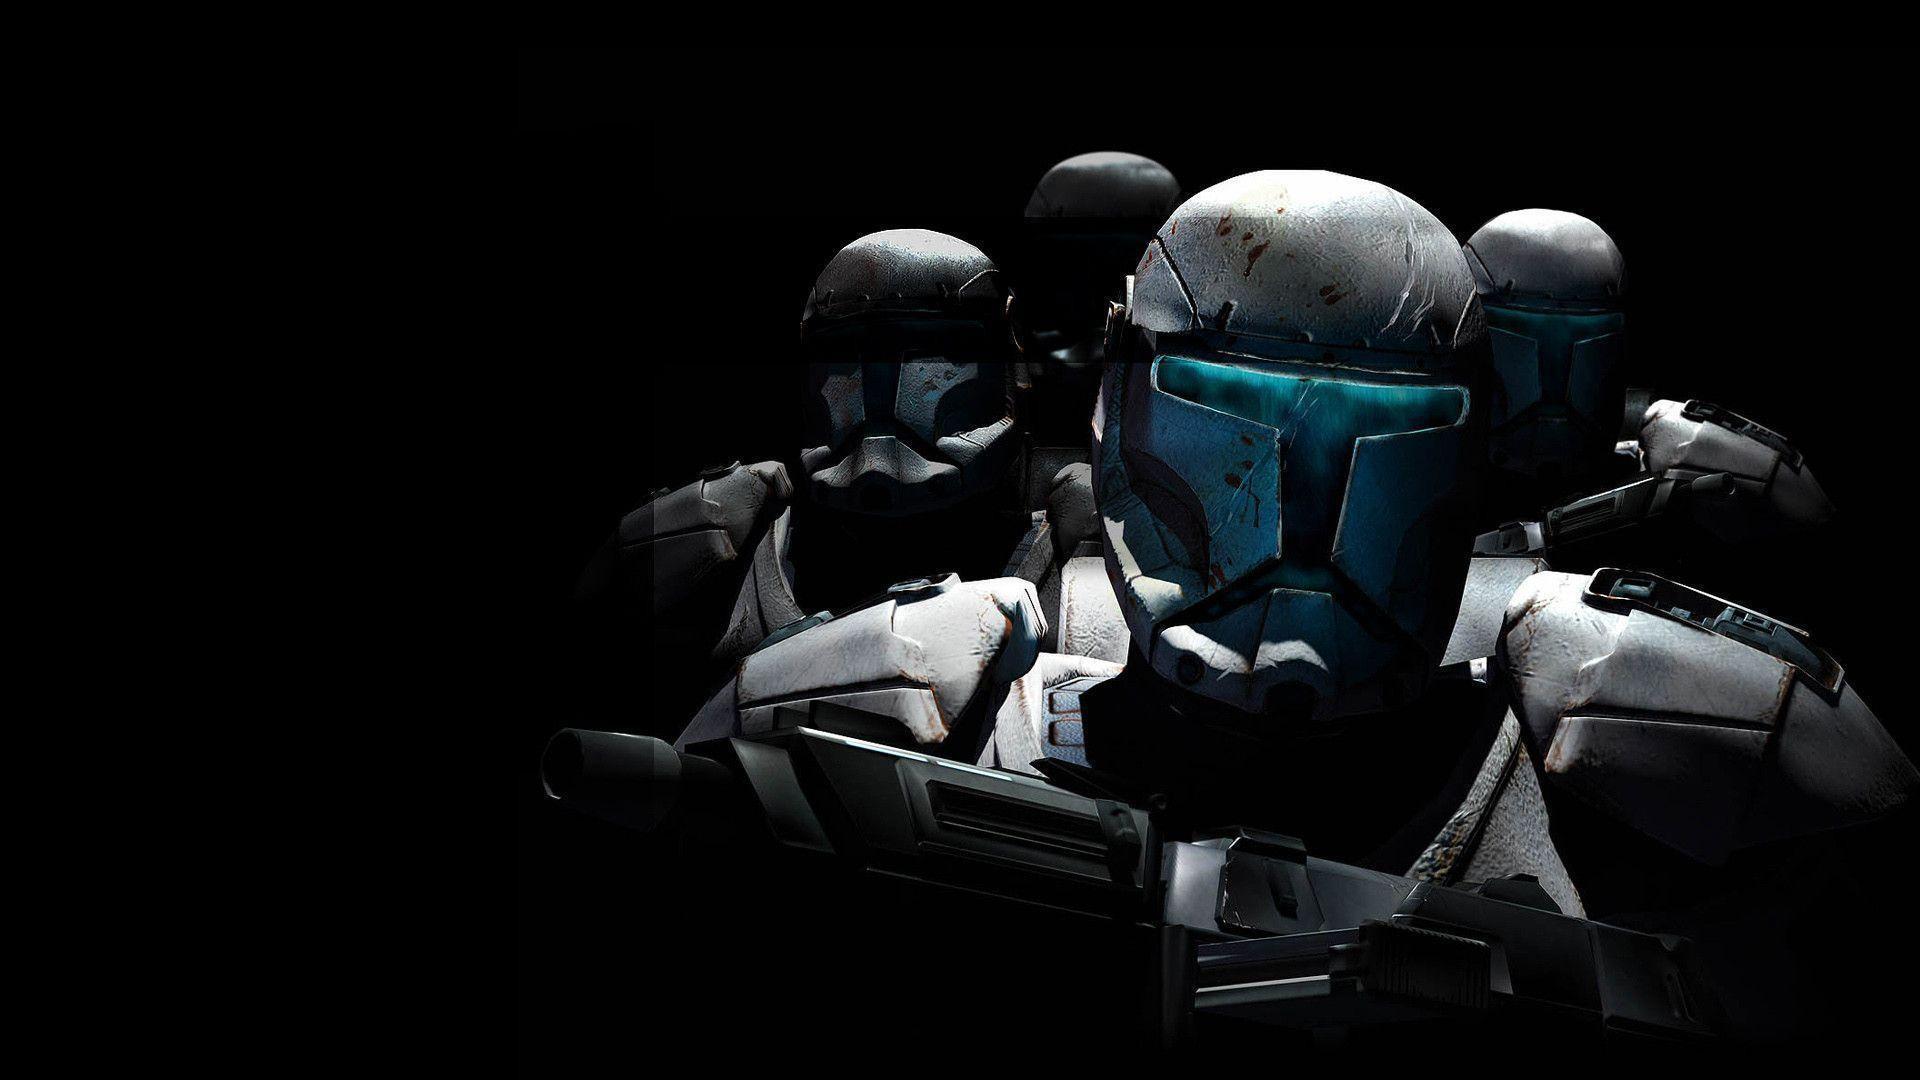 Clone Commando squad image – 501st Legion: Vader's Fist – Mod DB